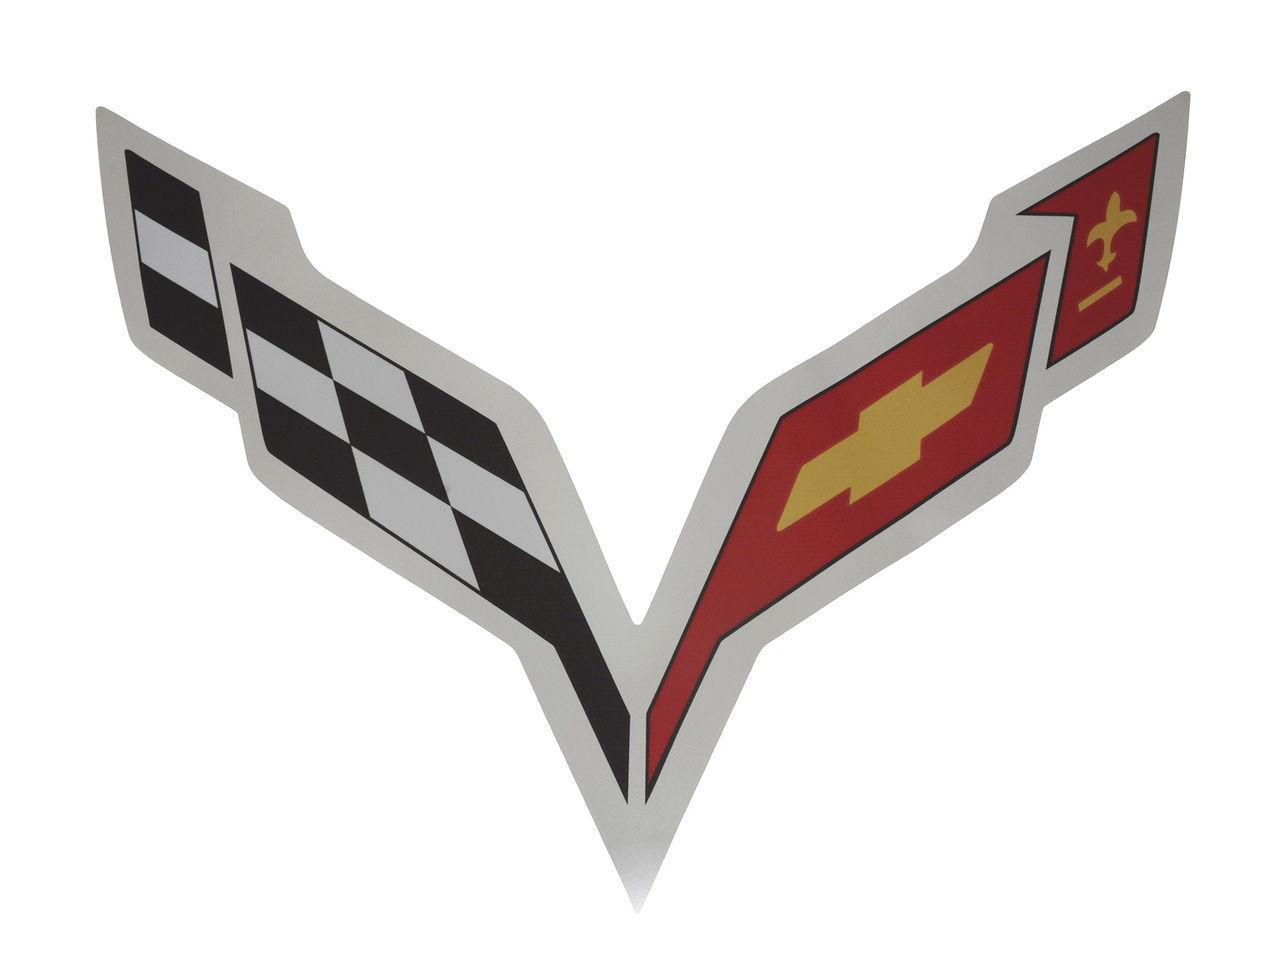 C7 Corvette Vinyl Hood Liner Pad Decal at RPI Designs ...